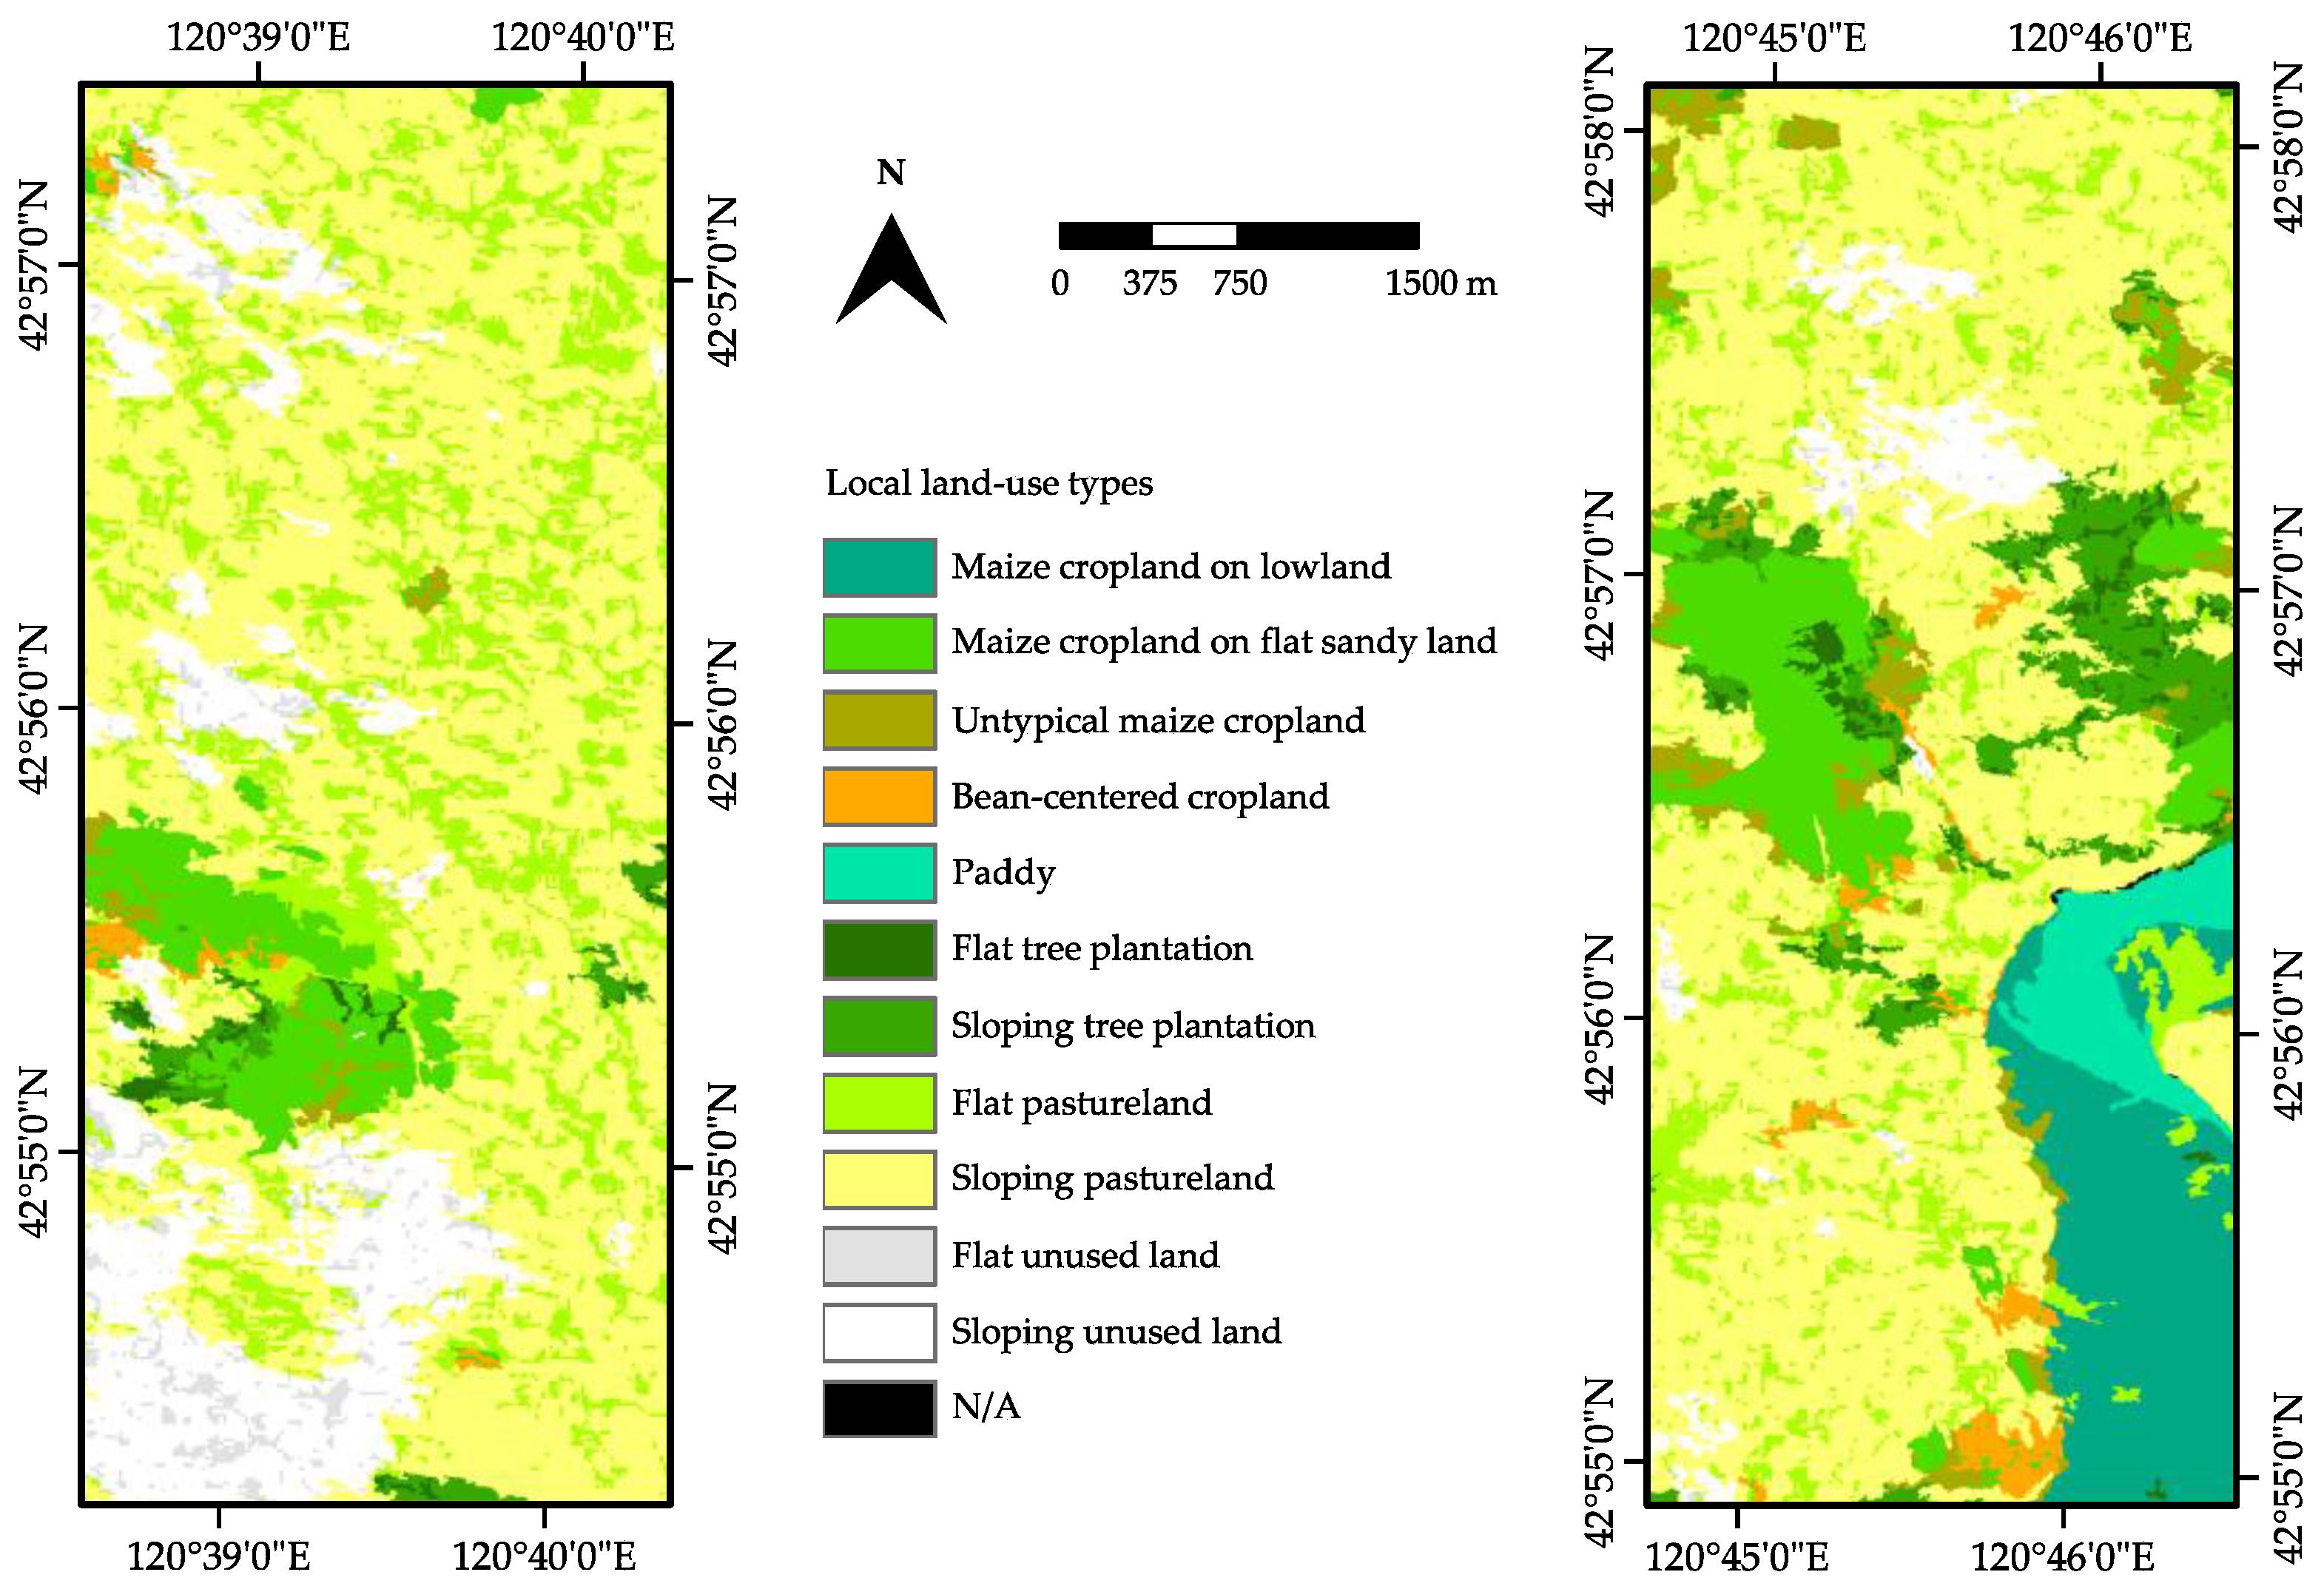 fao land use classification system pdf